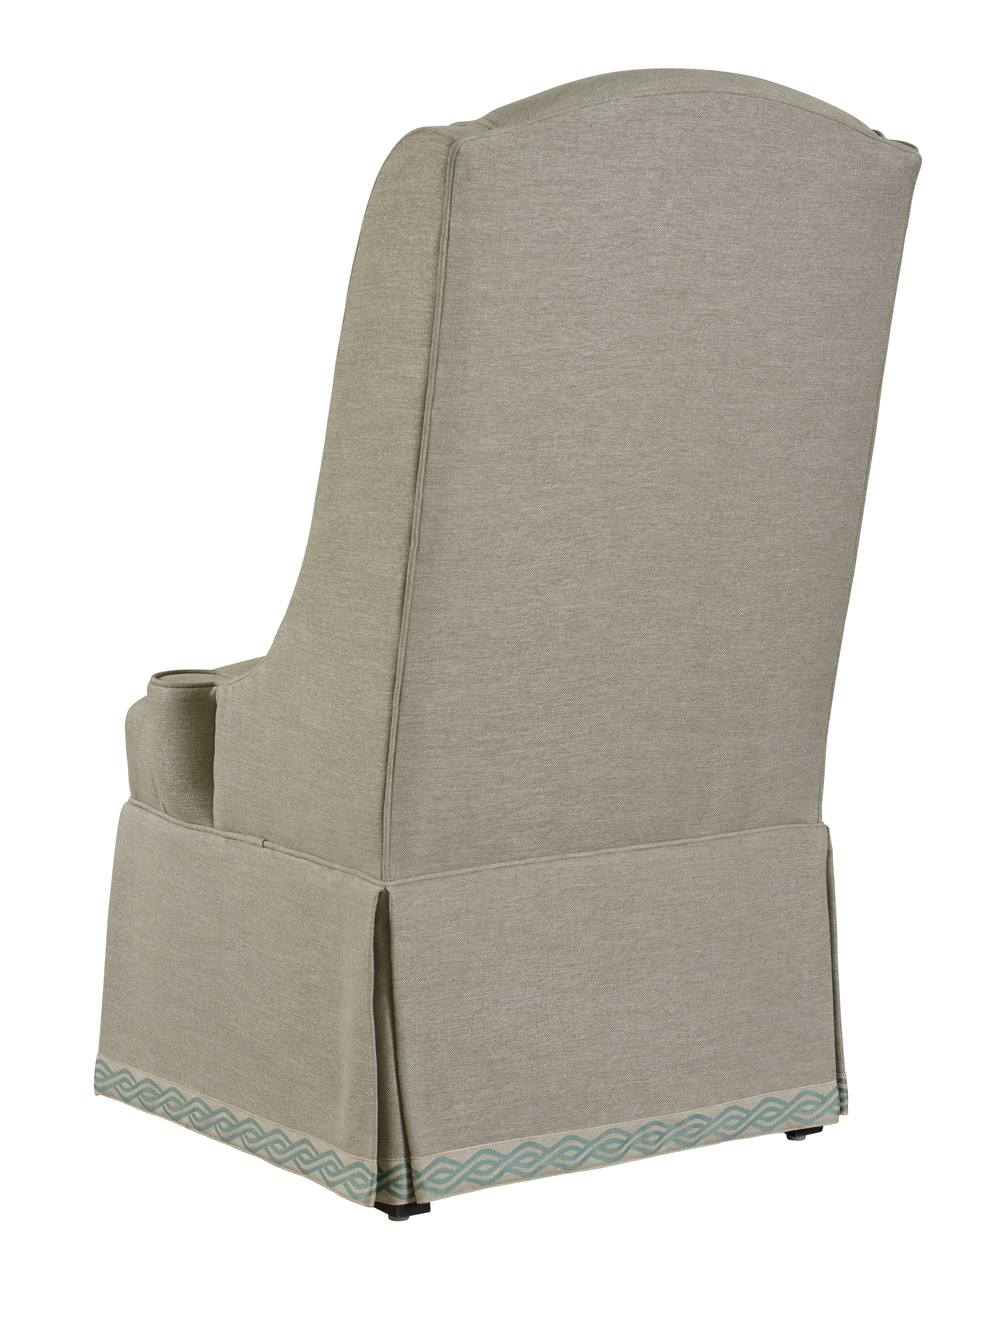 Designmaster Furniture - Weddington Hostess Chair